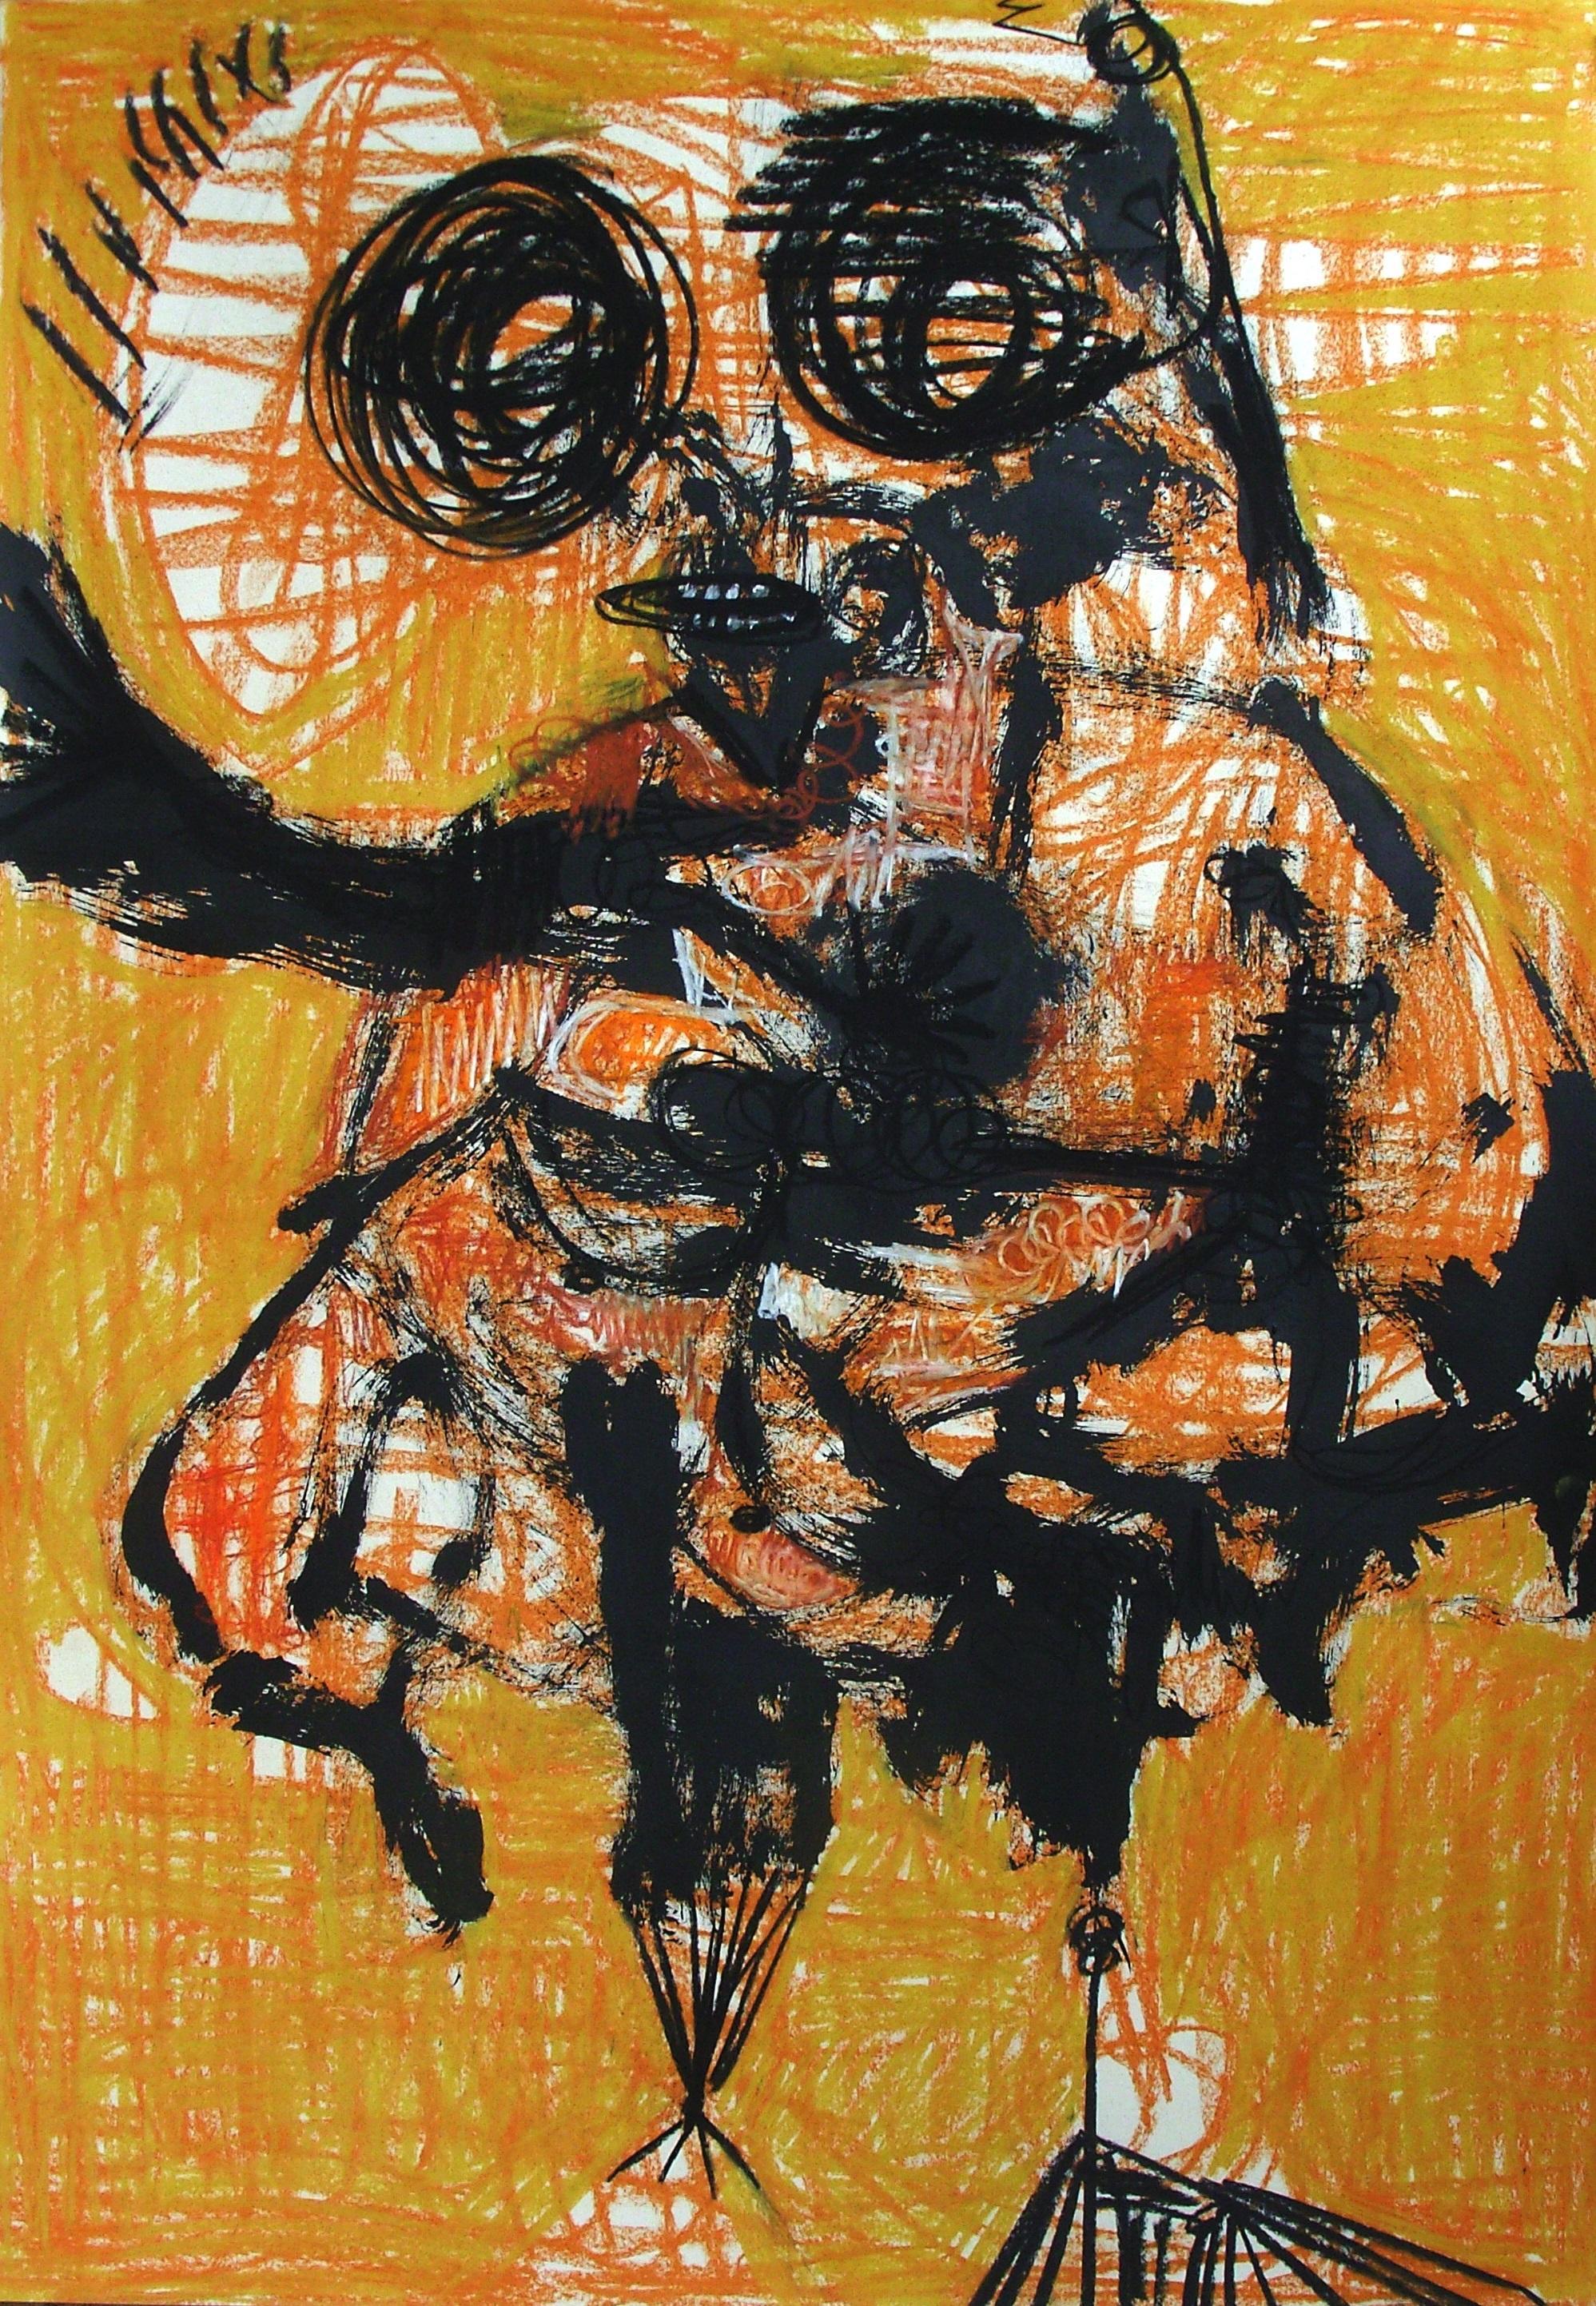 Untitled - Parmis Sayous 21st Century drawing, Iranian contemporary painter